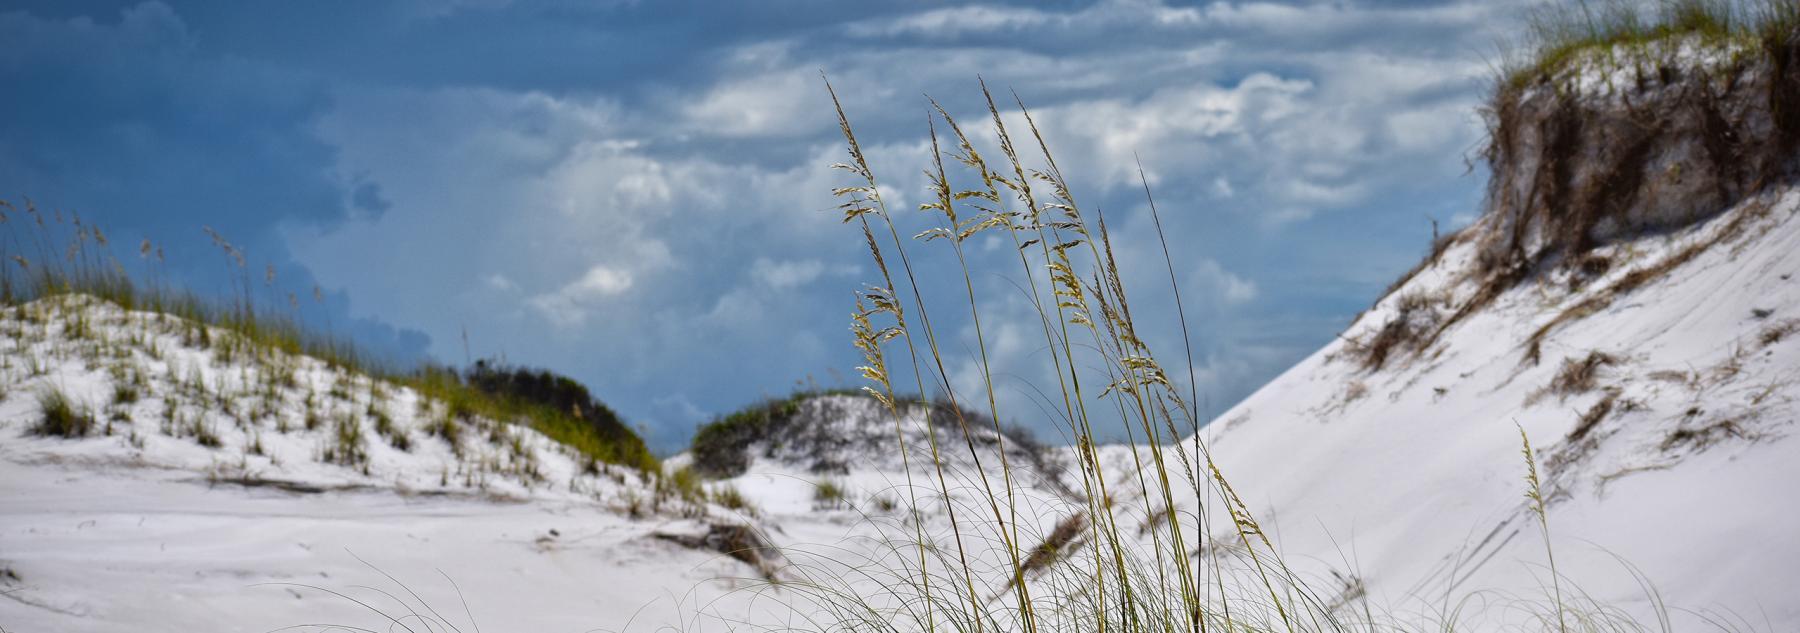 30A Sand Dunes Vacation Rentals